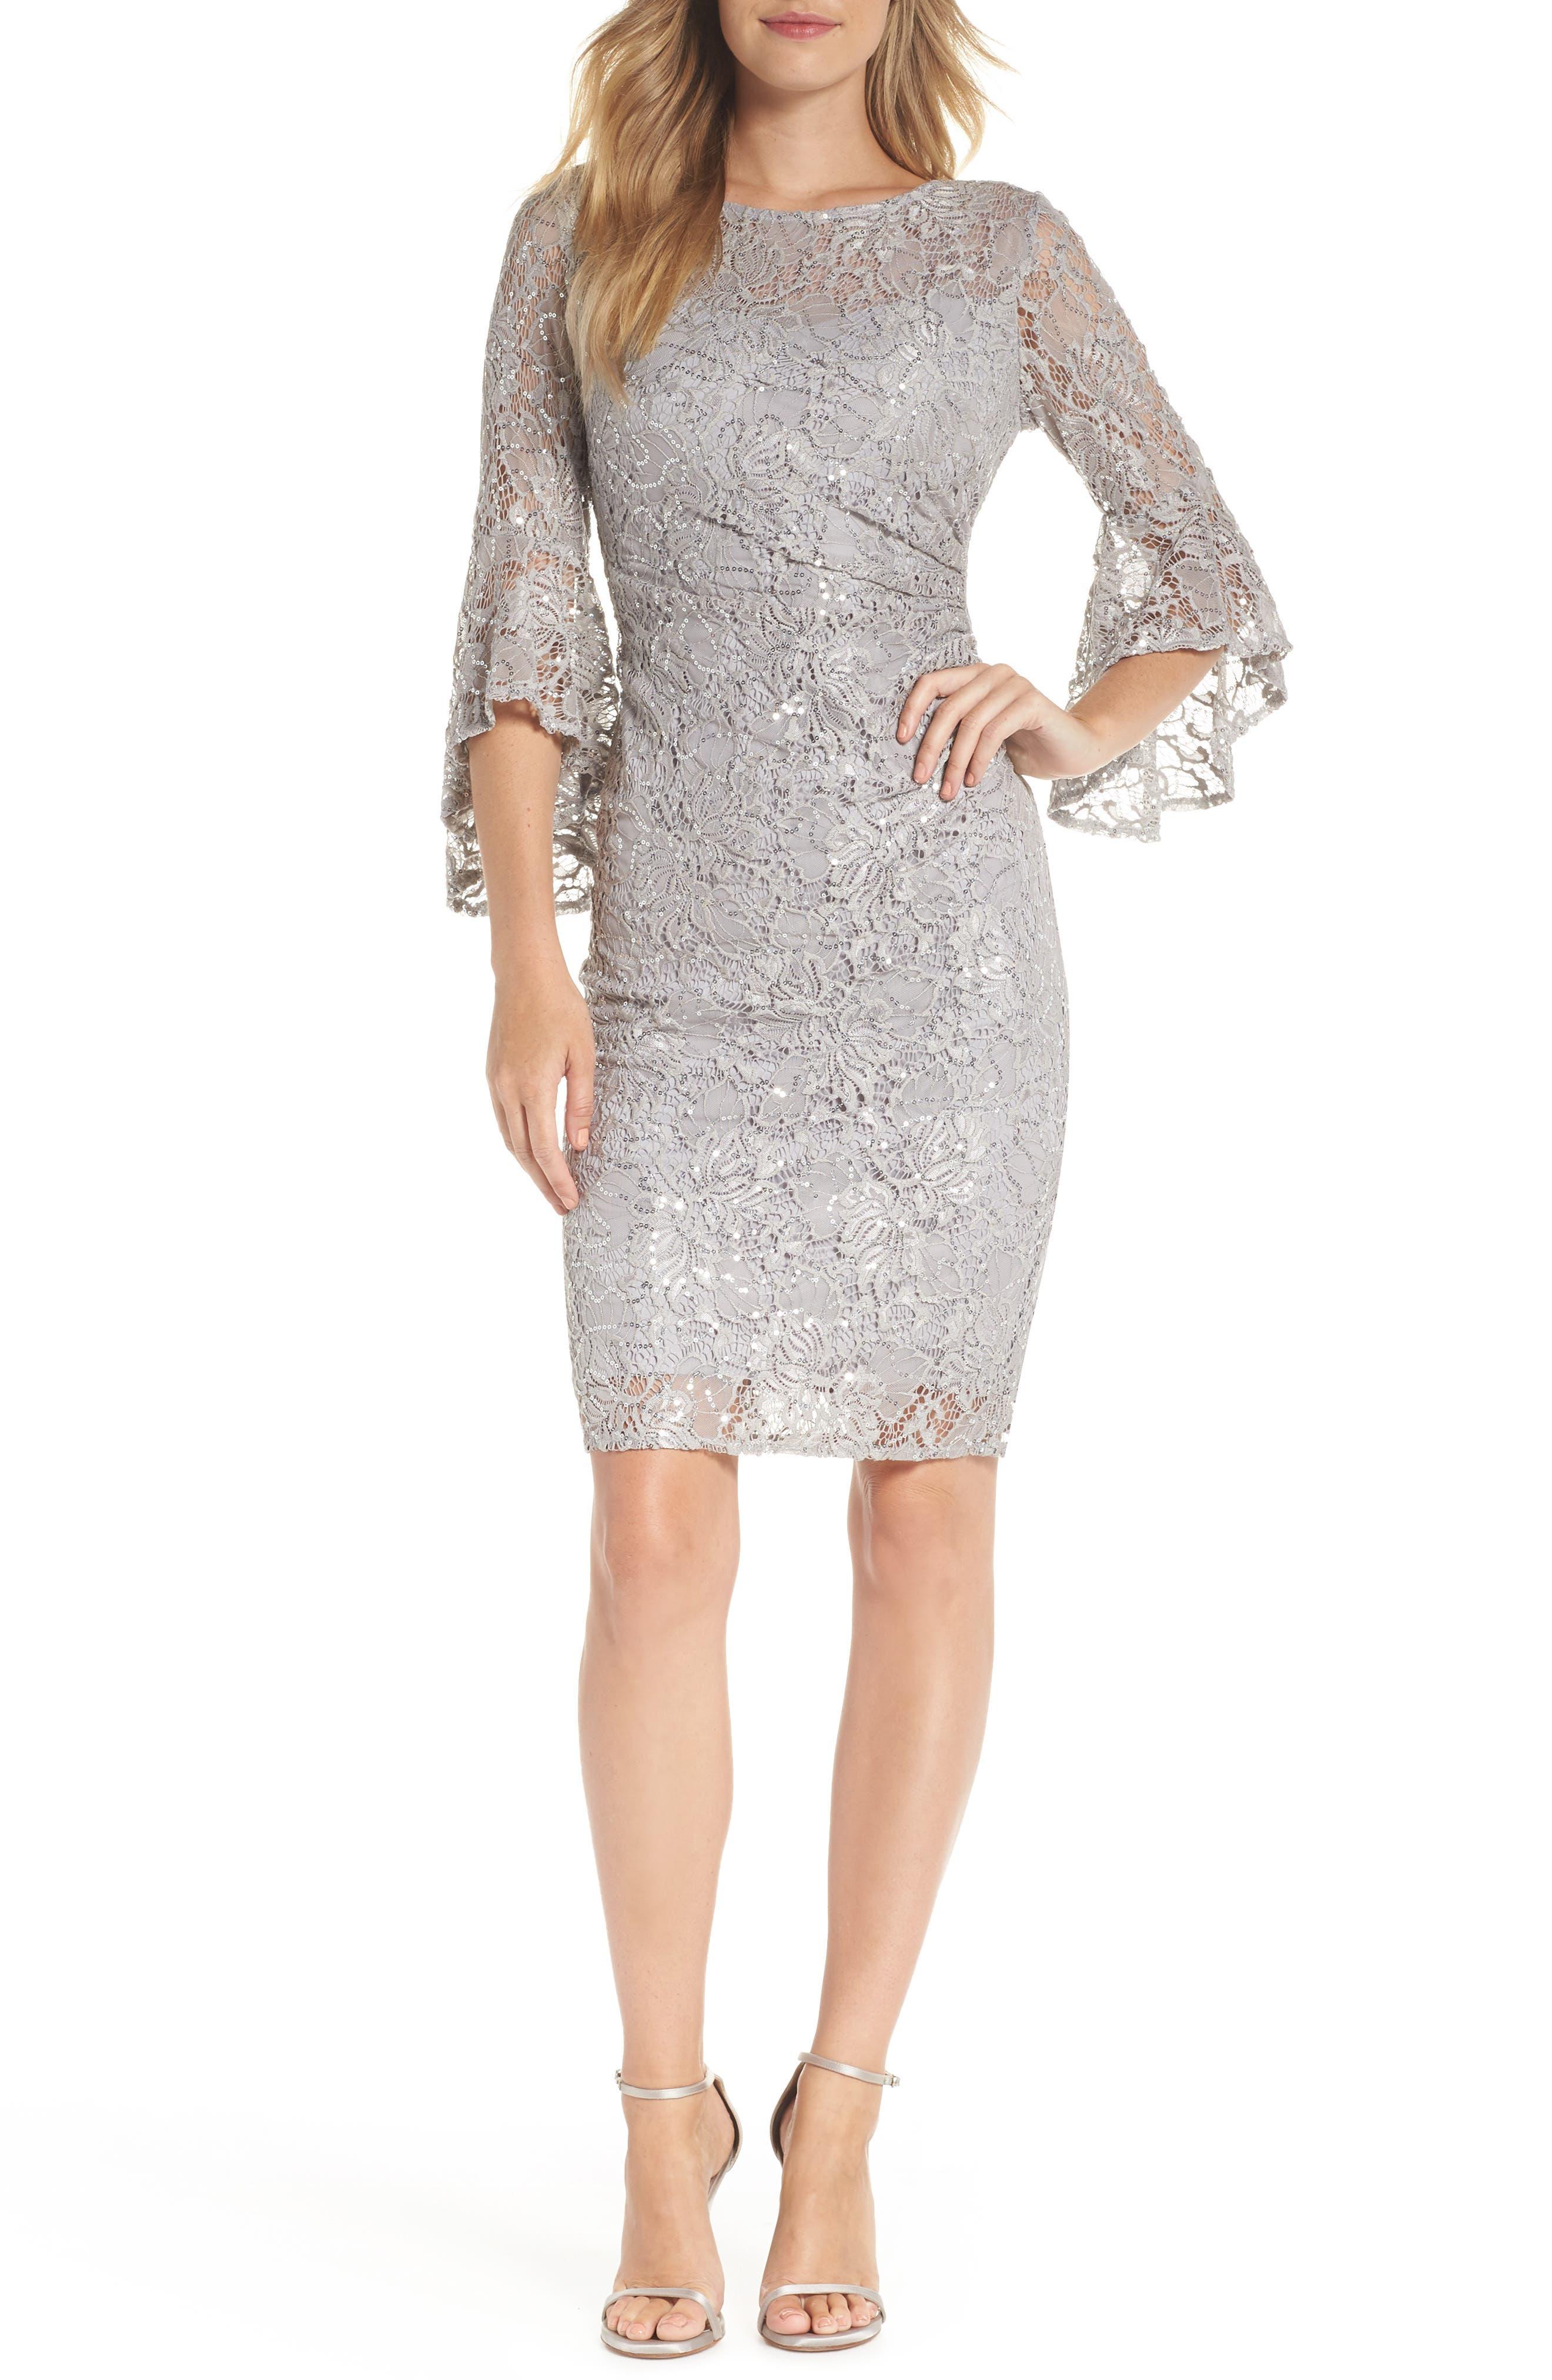 MORGAN & CO. Lace Sheath Dress, Main, color, 040